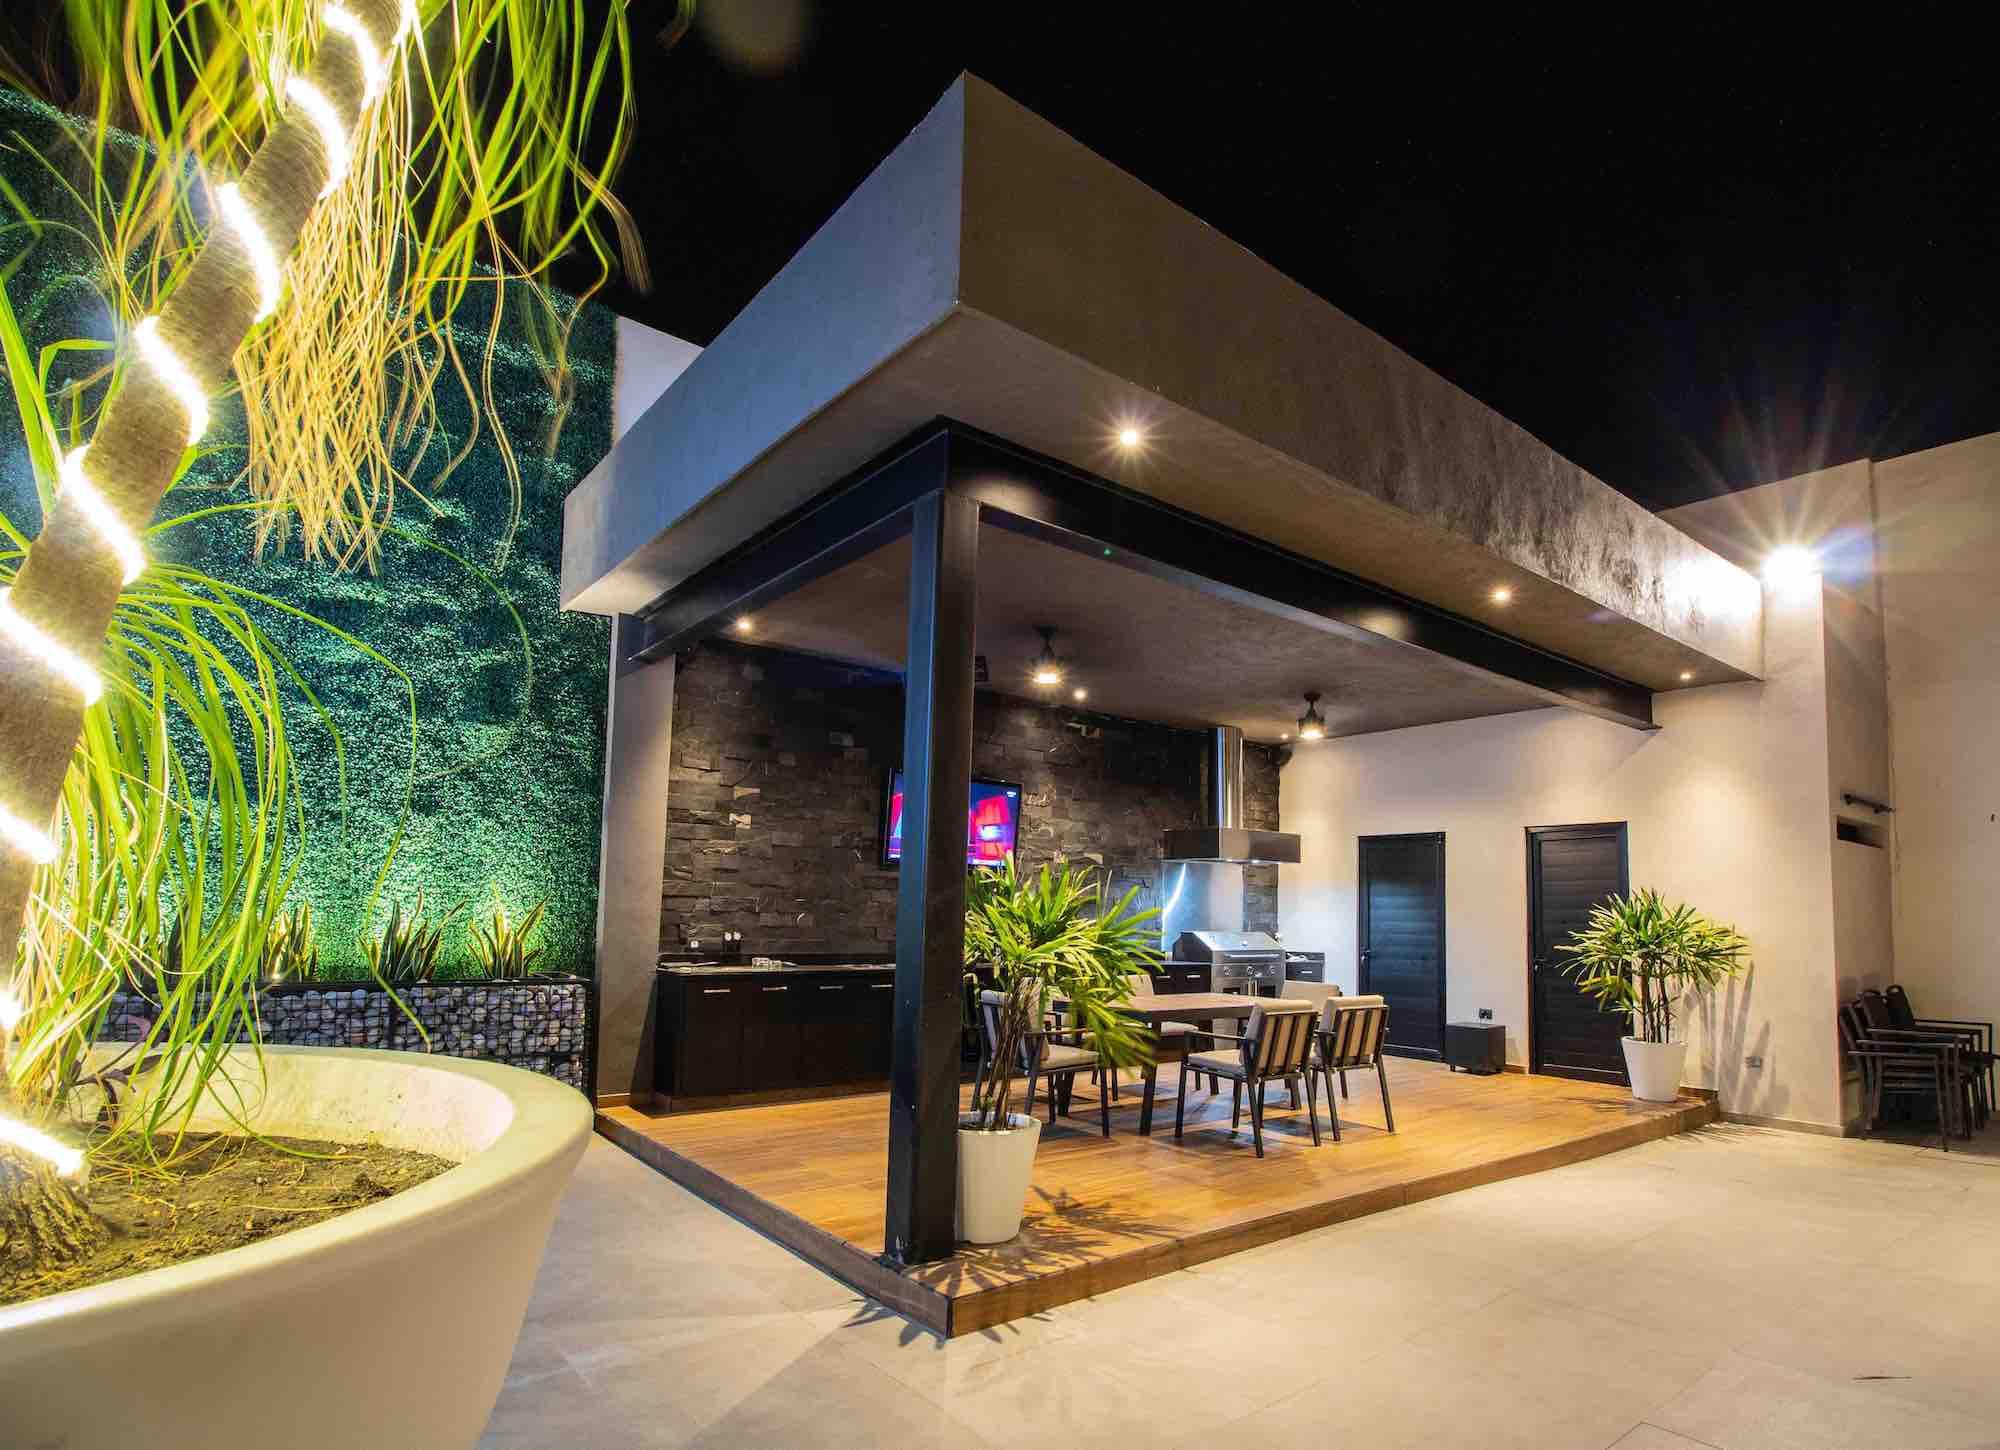 GR_House_Gallardo_arquitectura_amazingarchitecture_mexico_014.jpg